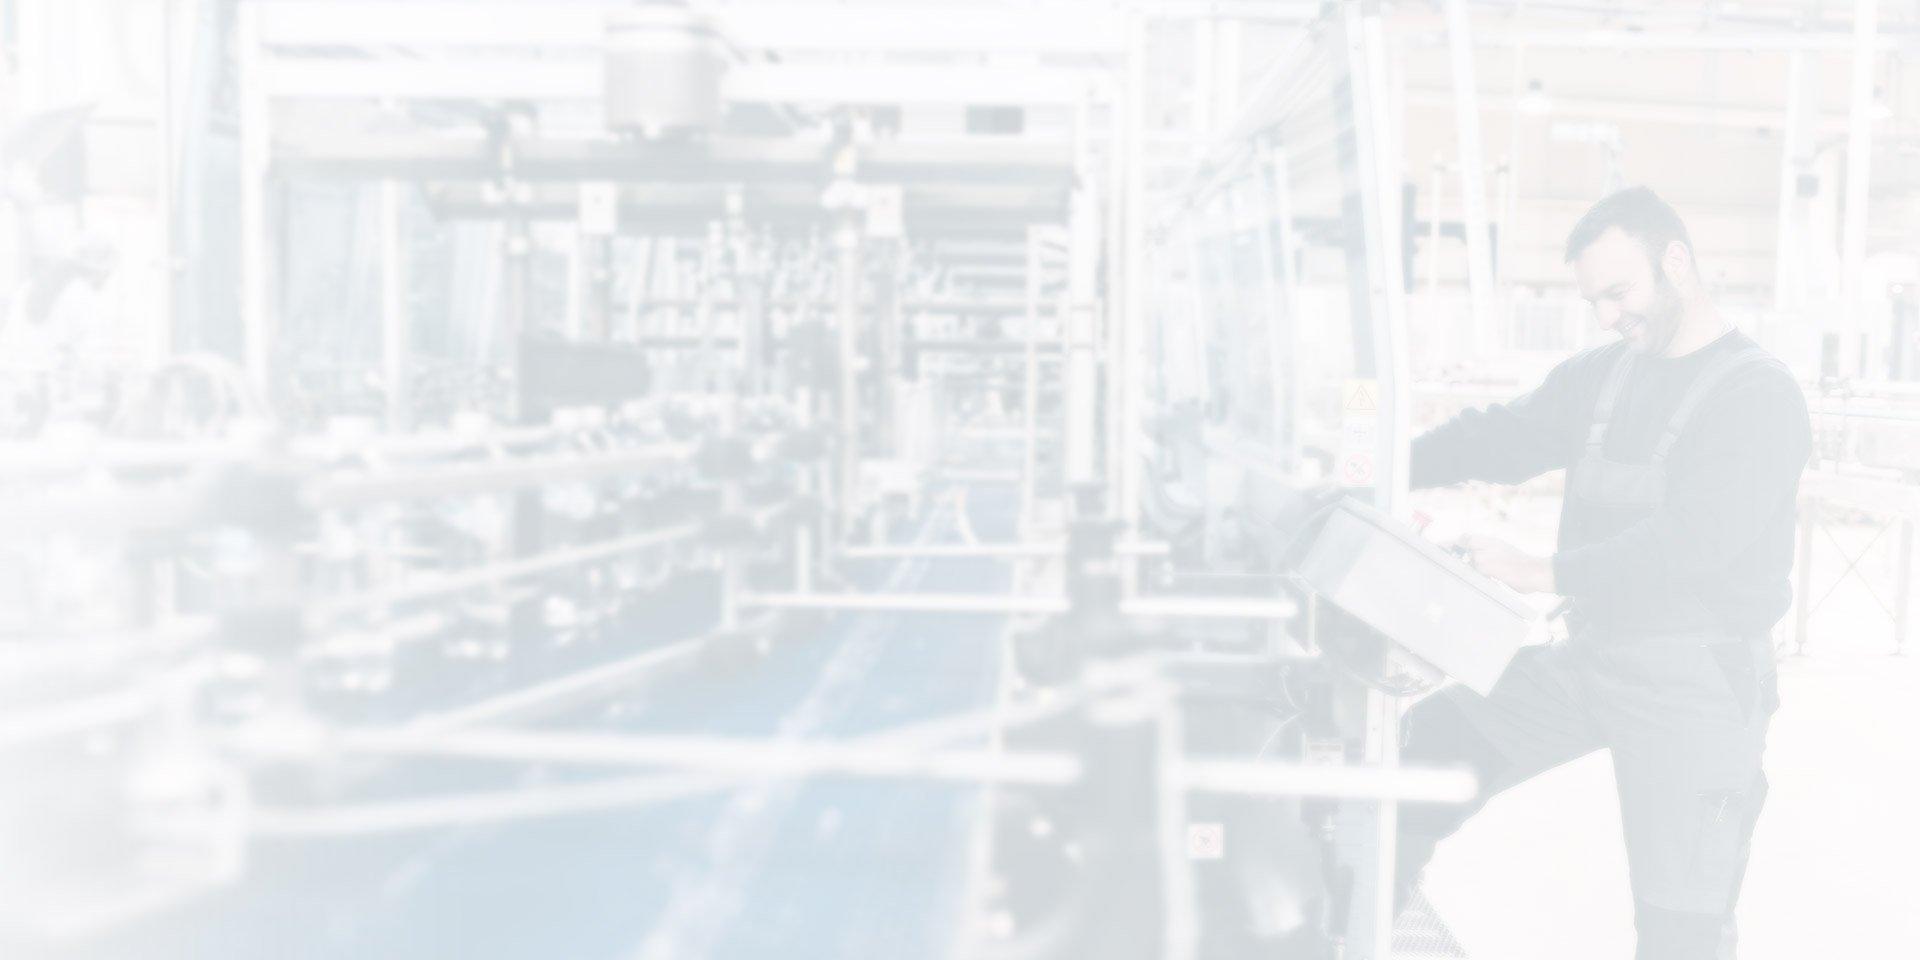 Private Label Beverage Manufacturing